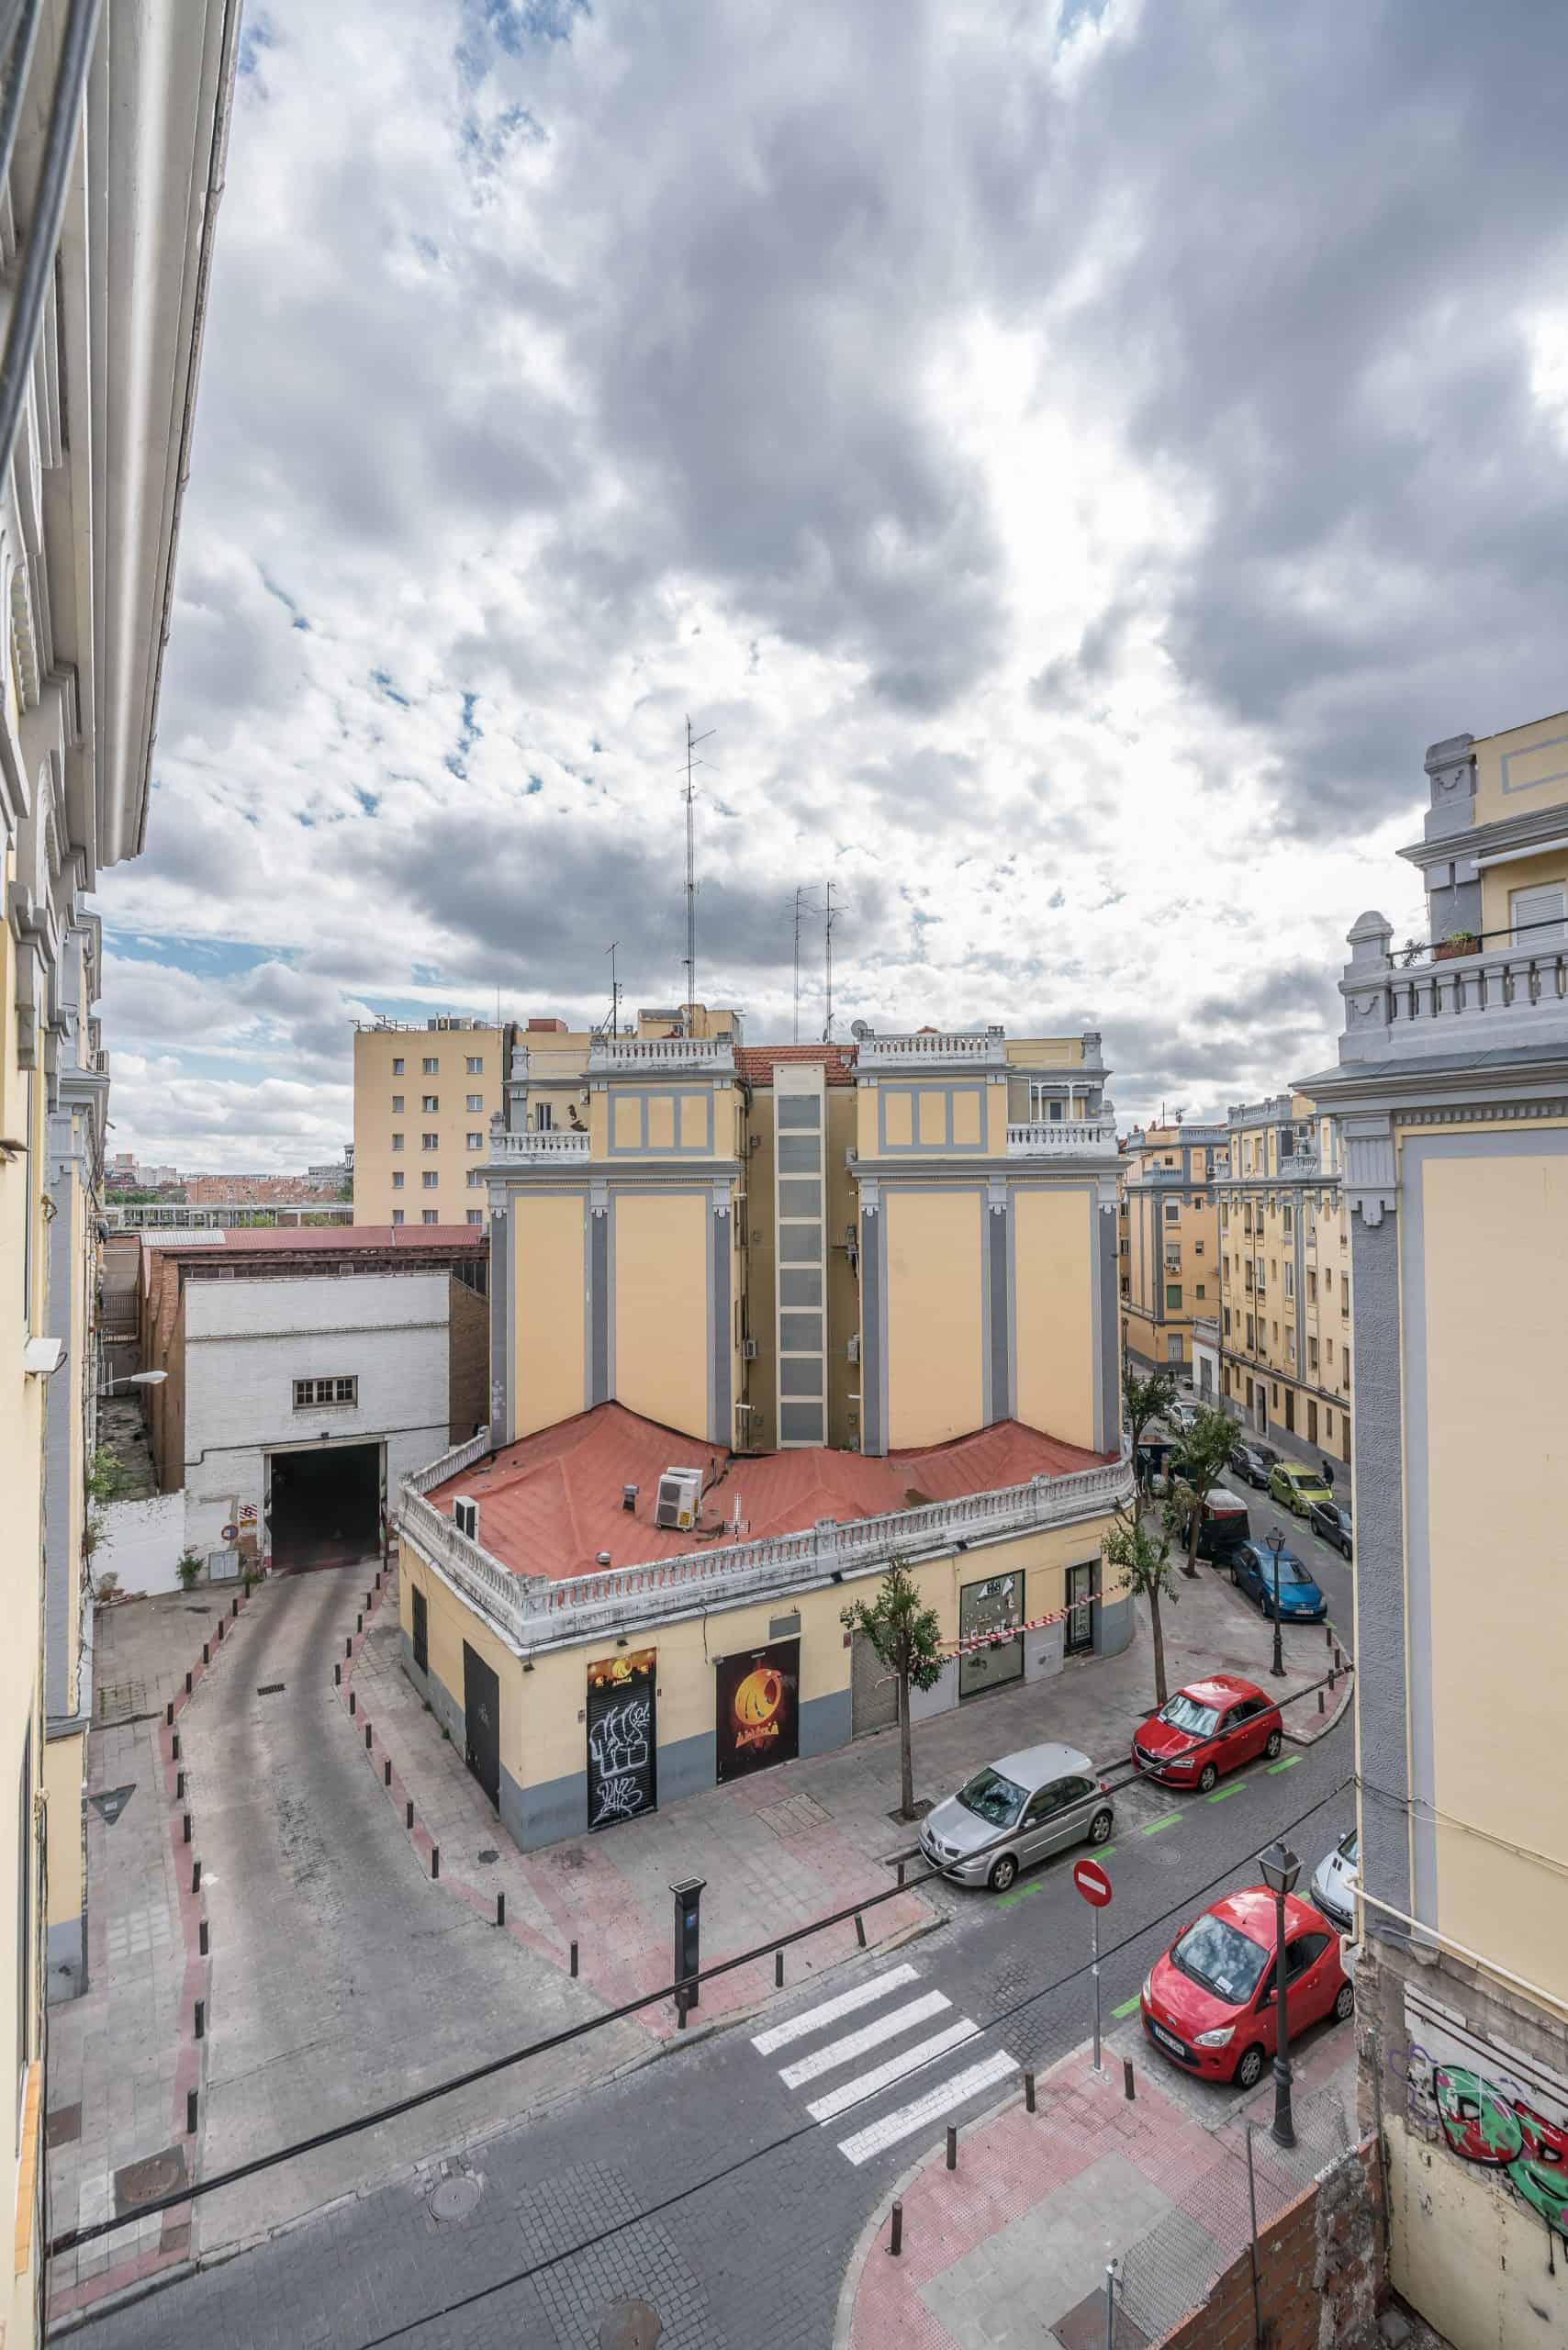 Agencia Inmobiliaria de Madrid-FUTUROCASA-Zona ARGANZUELA-EMBAJADORES-LEGAZPI7 VISTAS (2)